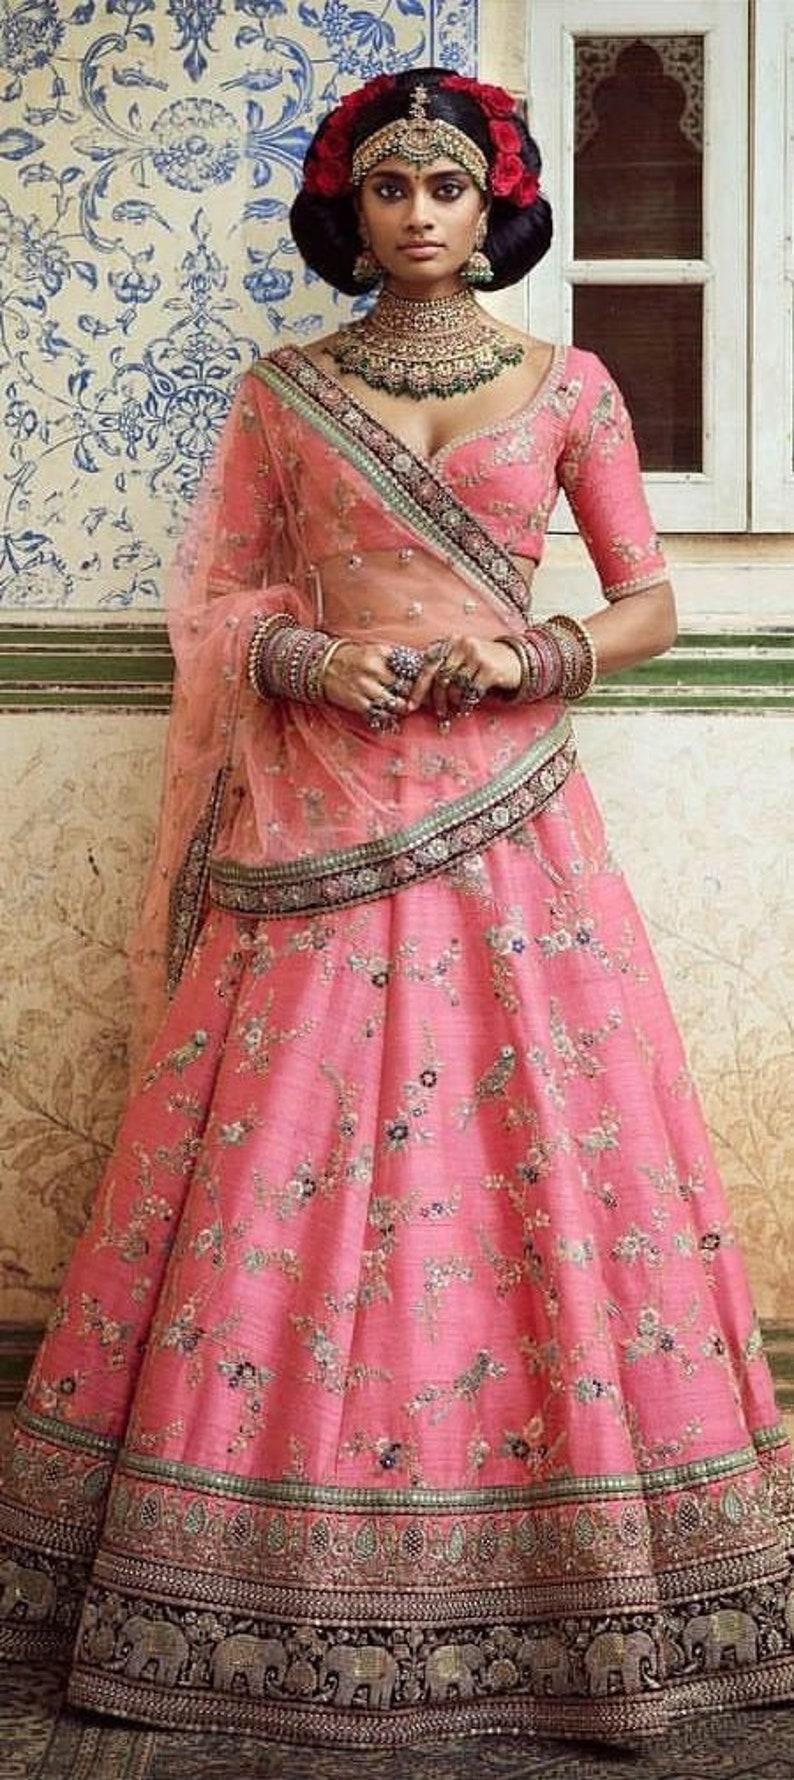 Art Silk Mehendi Sangeet Lehenga in Pink and Majenta with Thread work